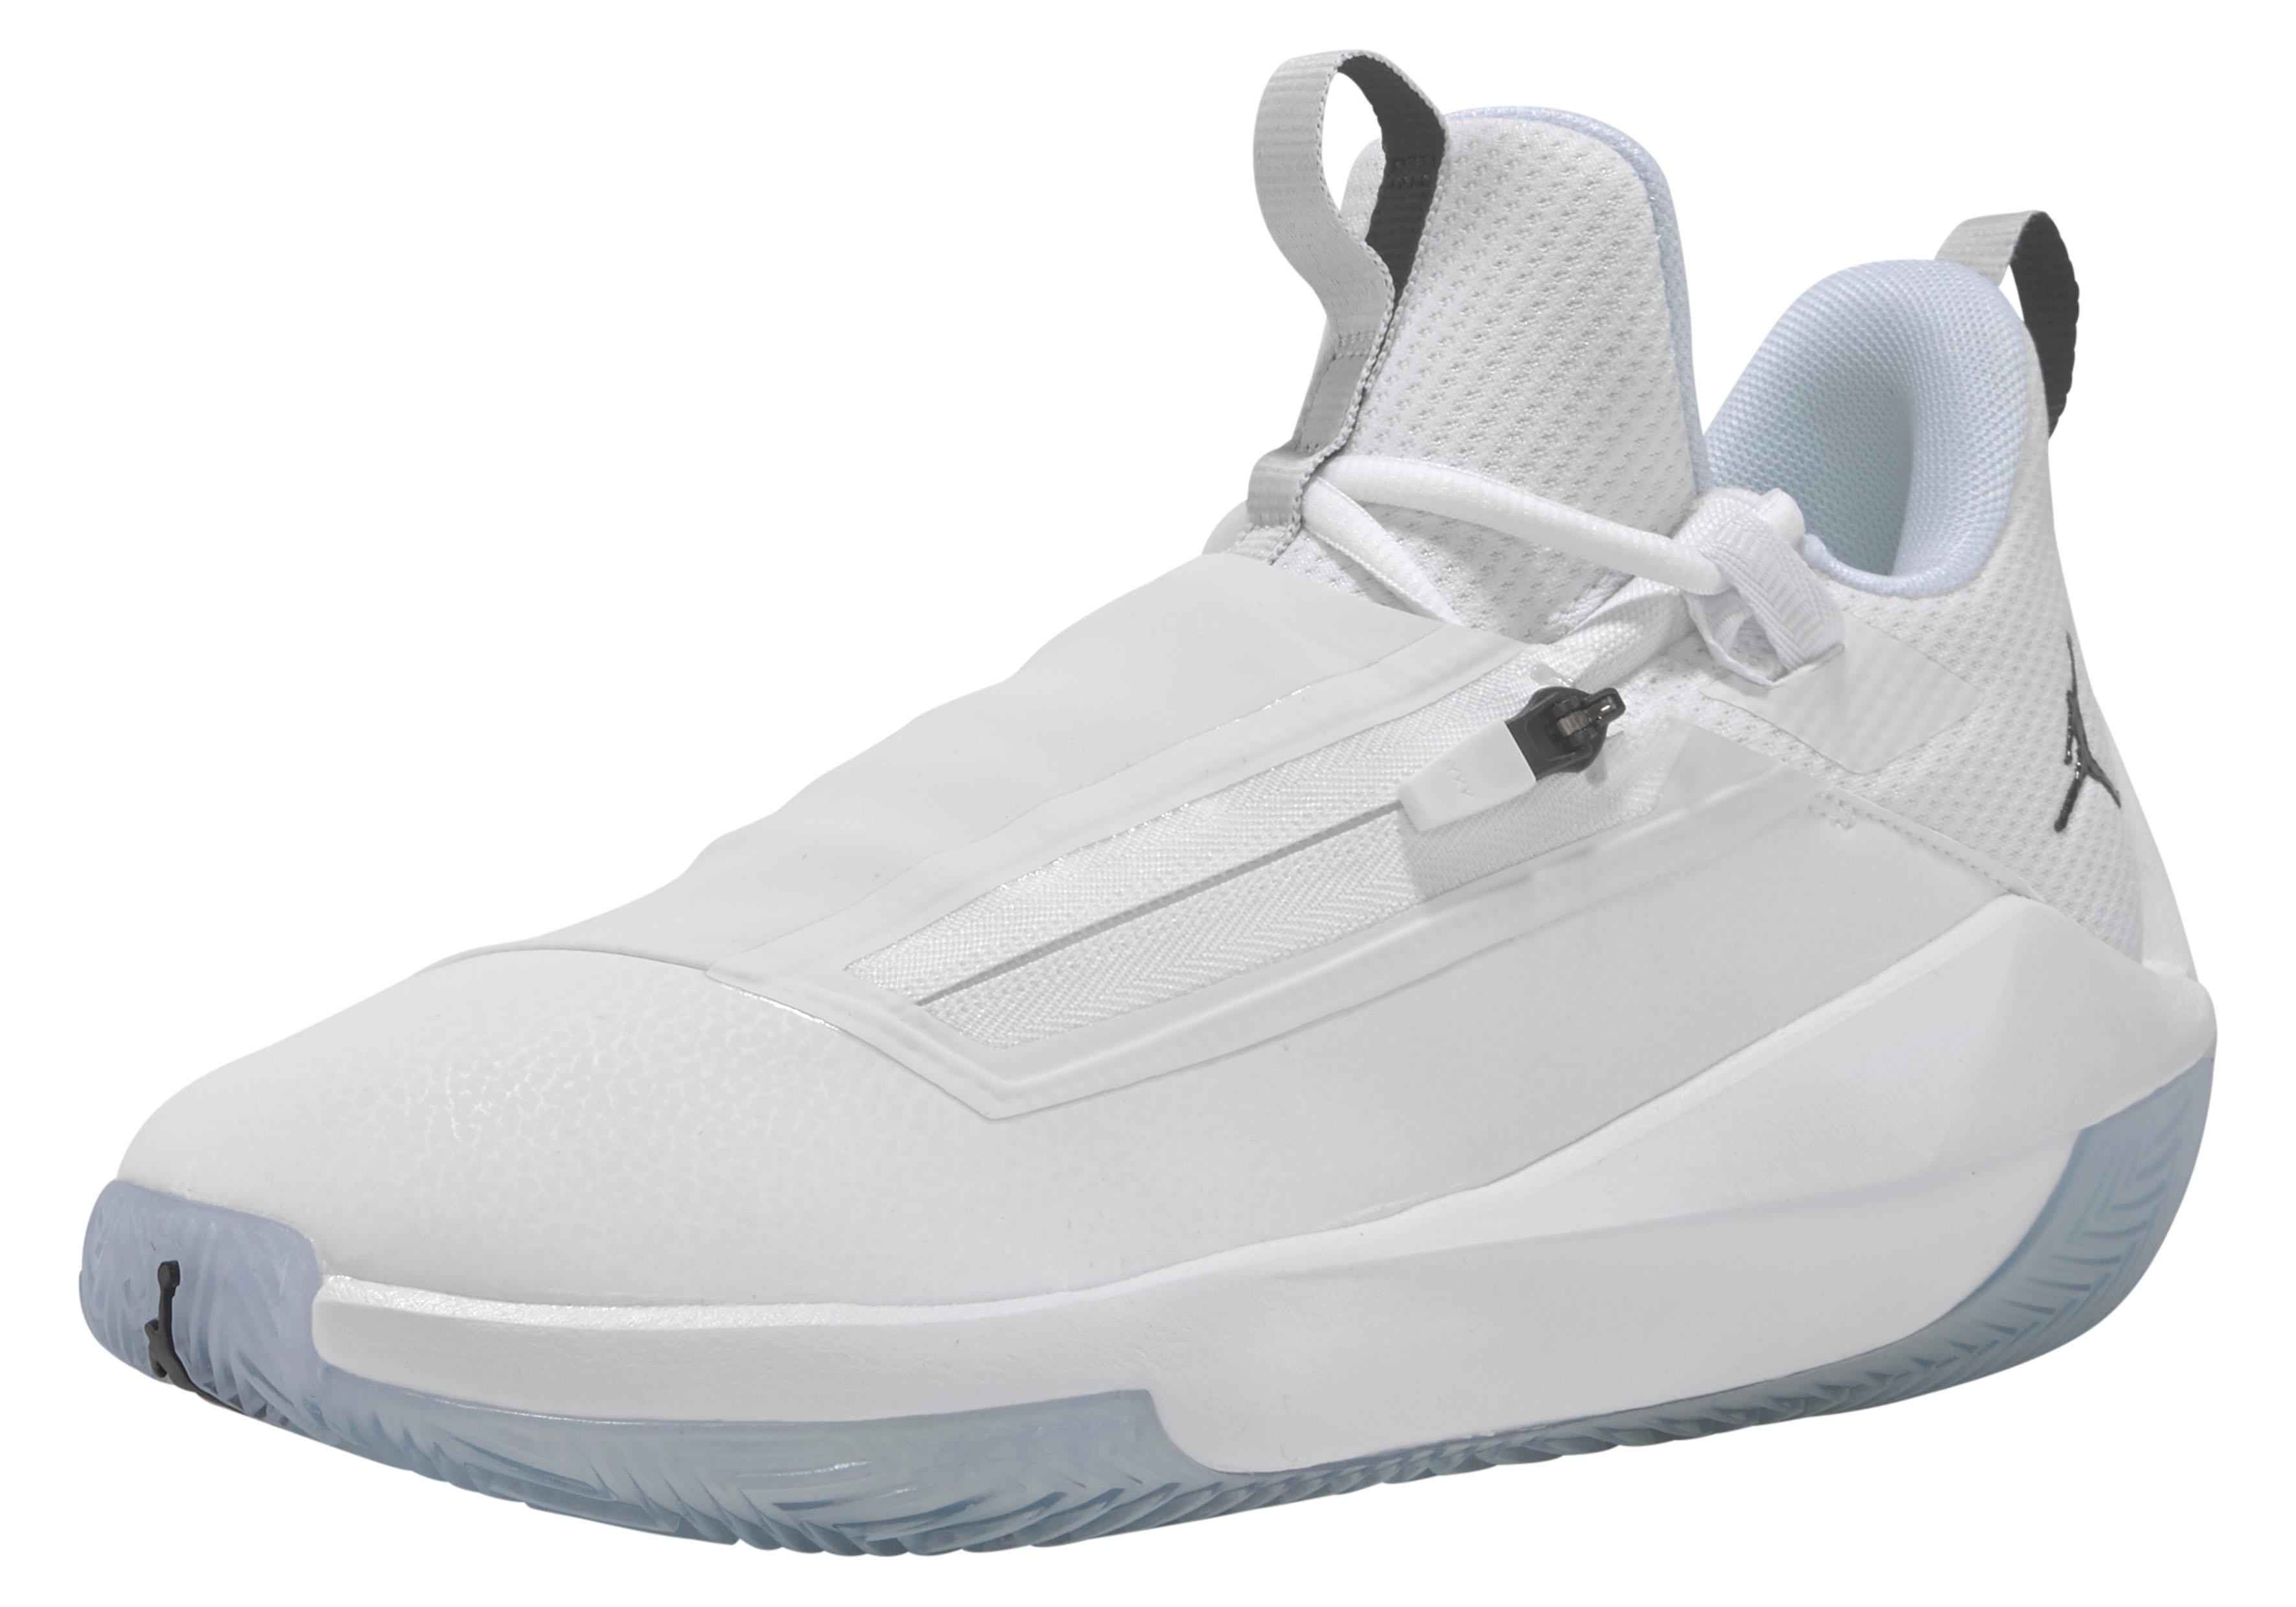 discount ed3cc 706b5 Bildquelle  Jordan Basketballschuh »Jordan Jumpman Hustle«